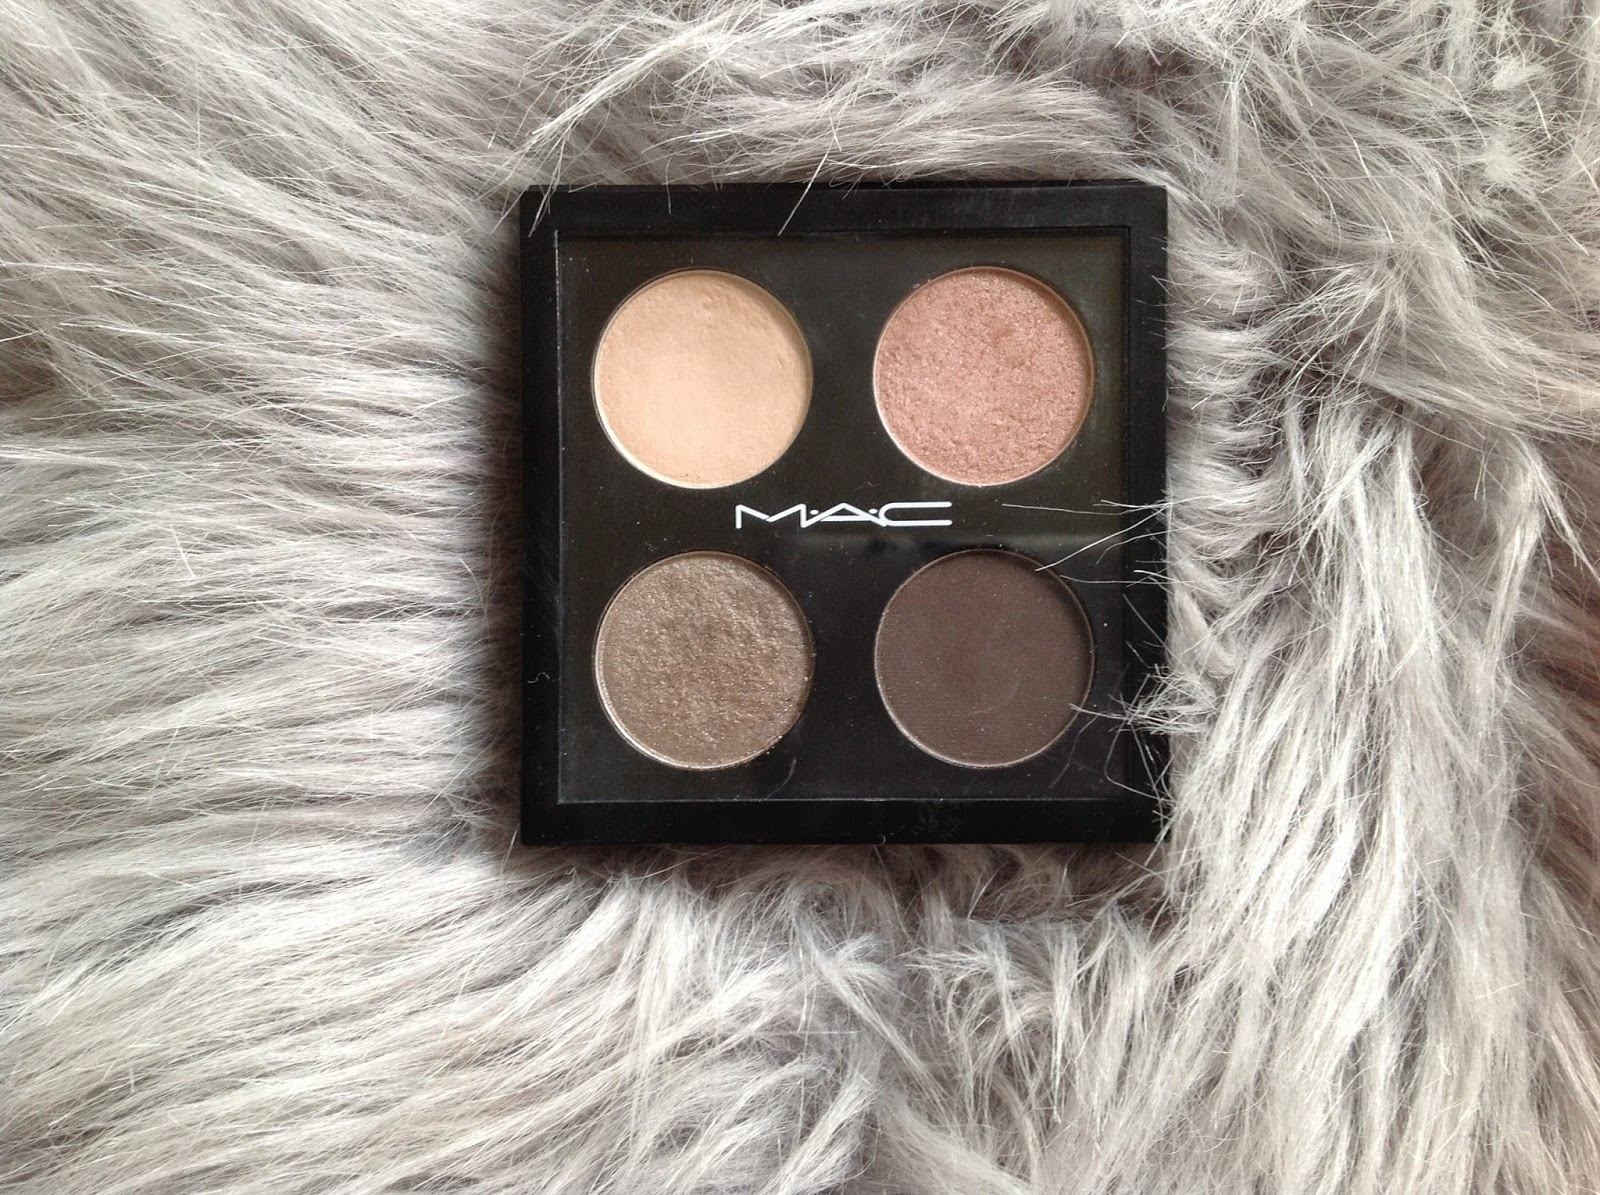 mac eyeshadow quad showstopper review